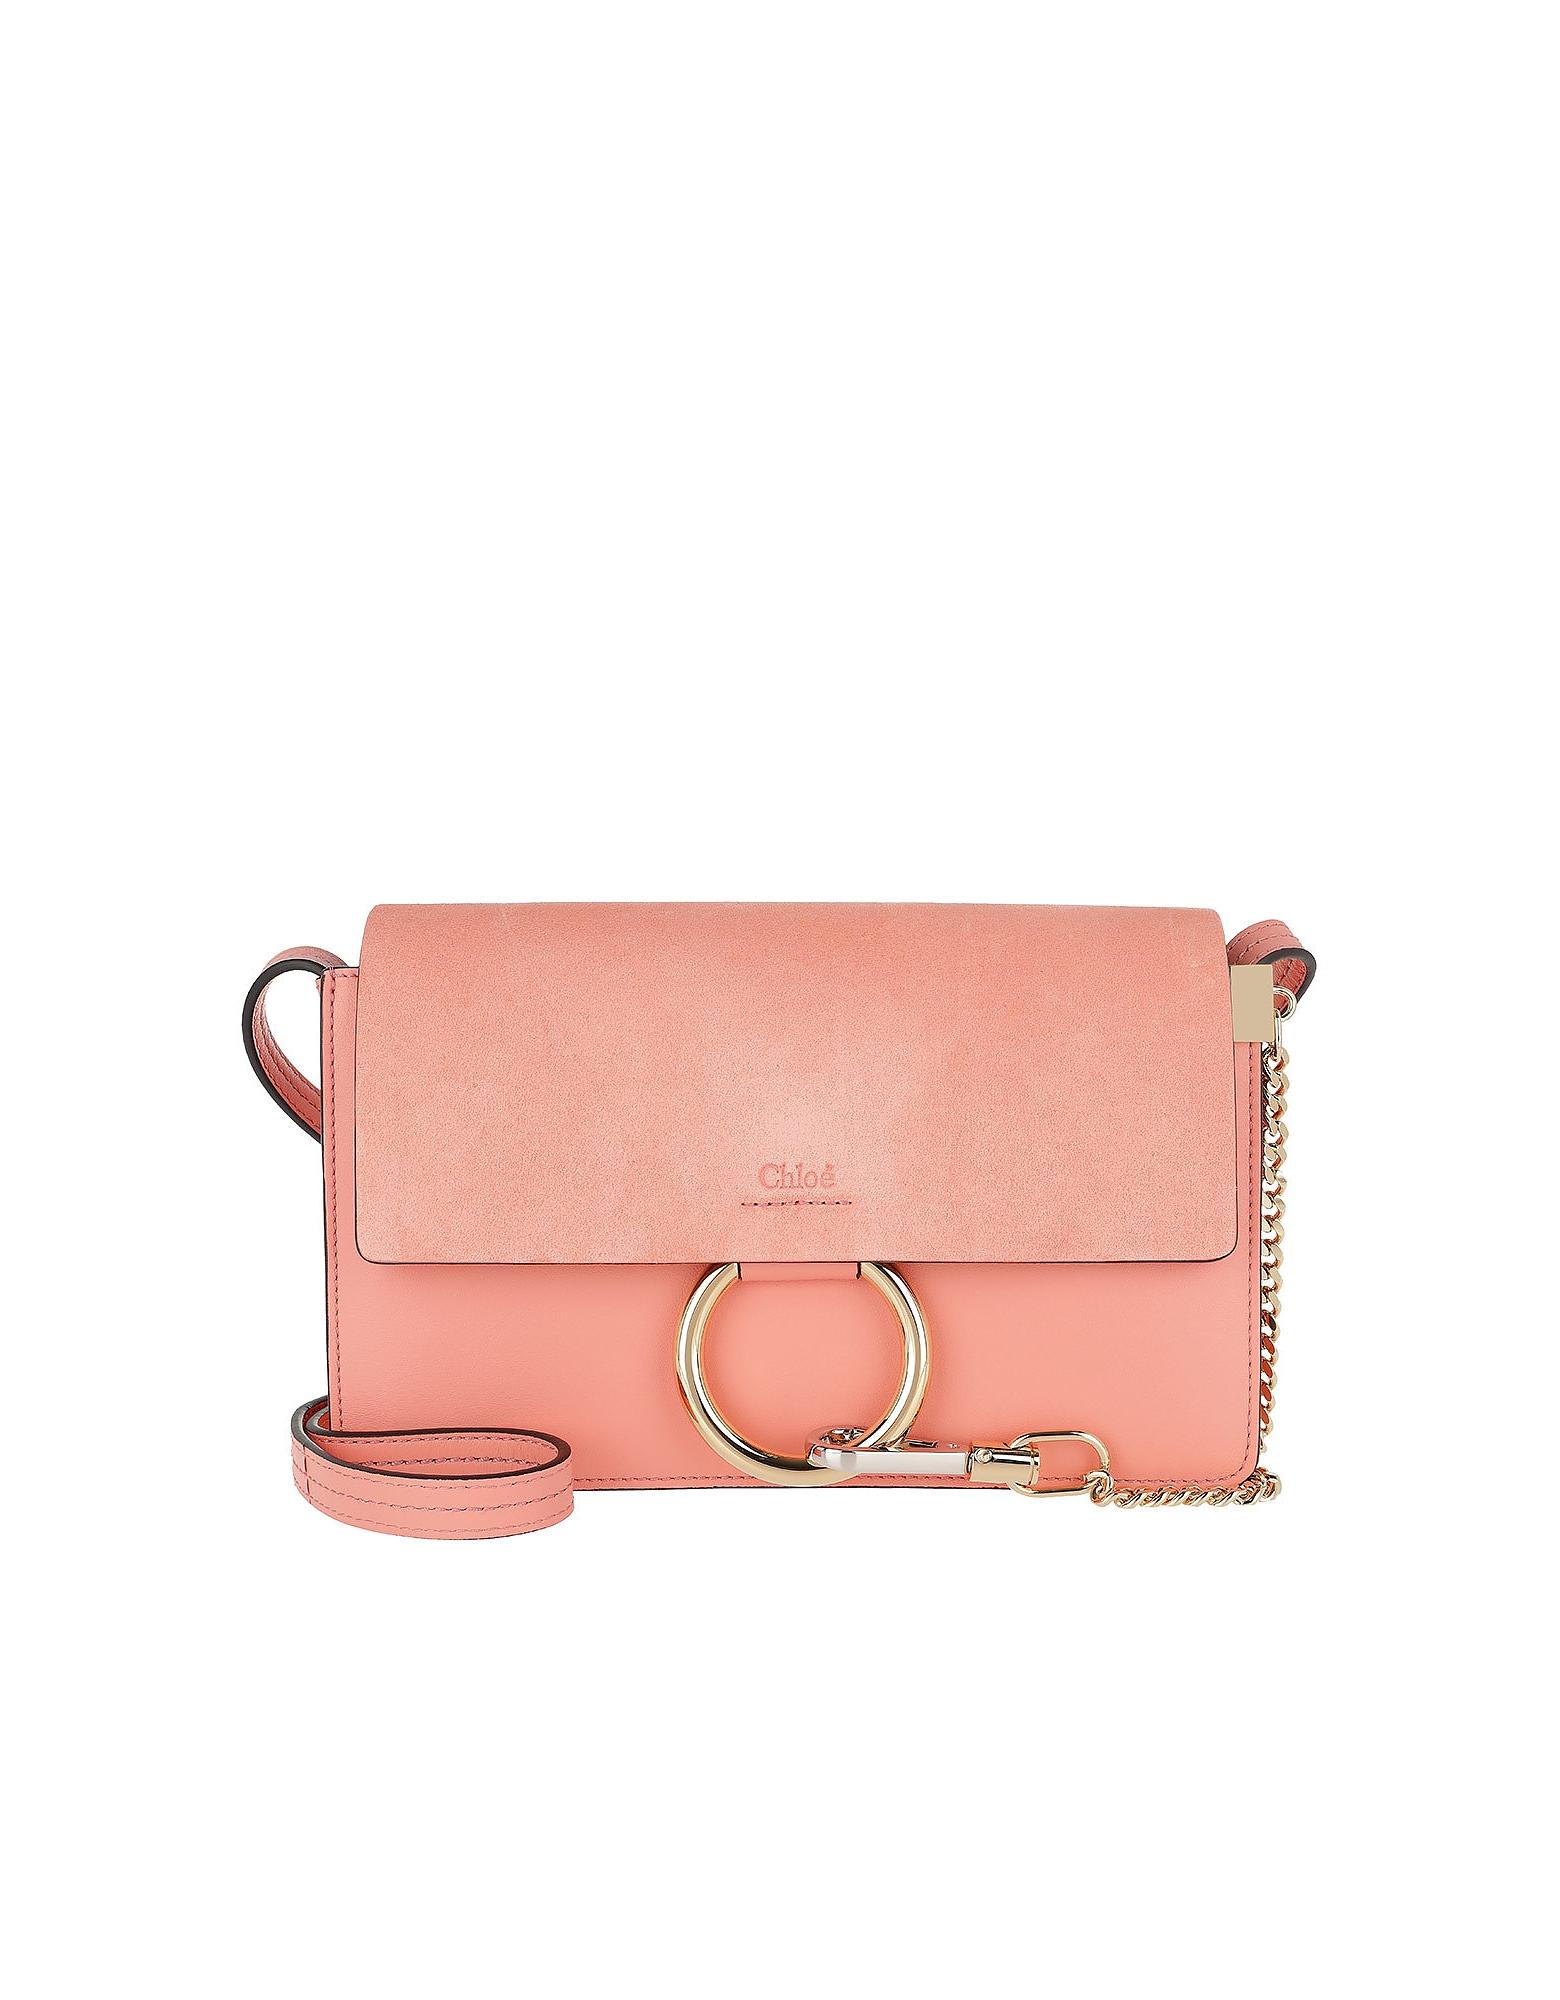 Chloe Handbags, Faye Small Shoulder Bag Ideal Blush